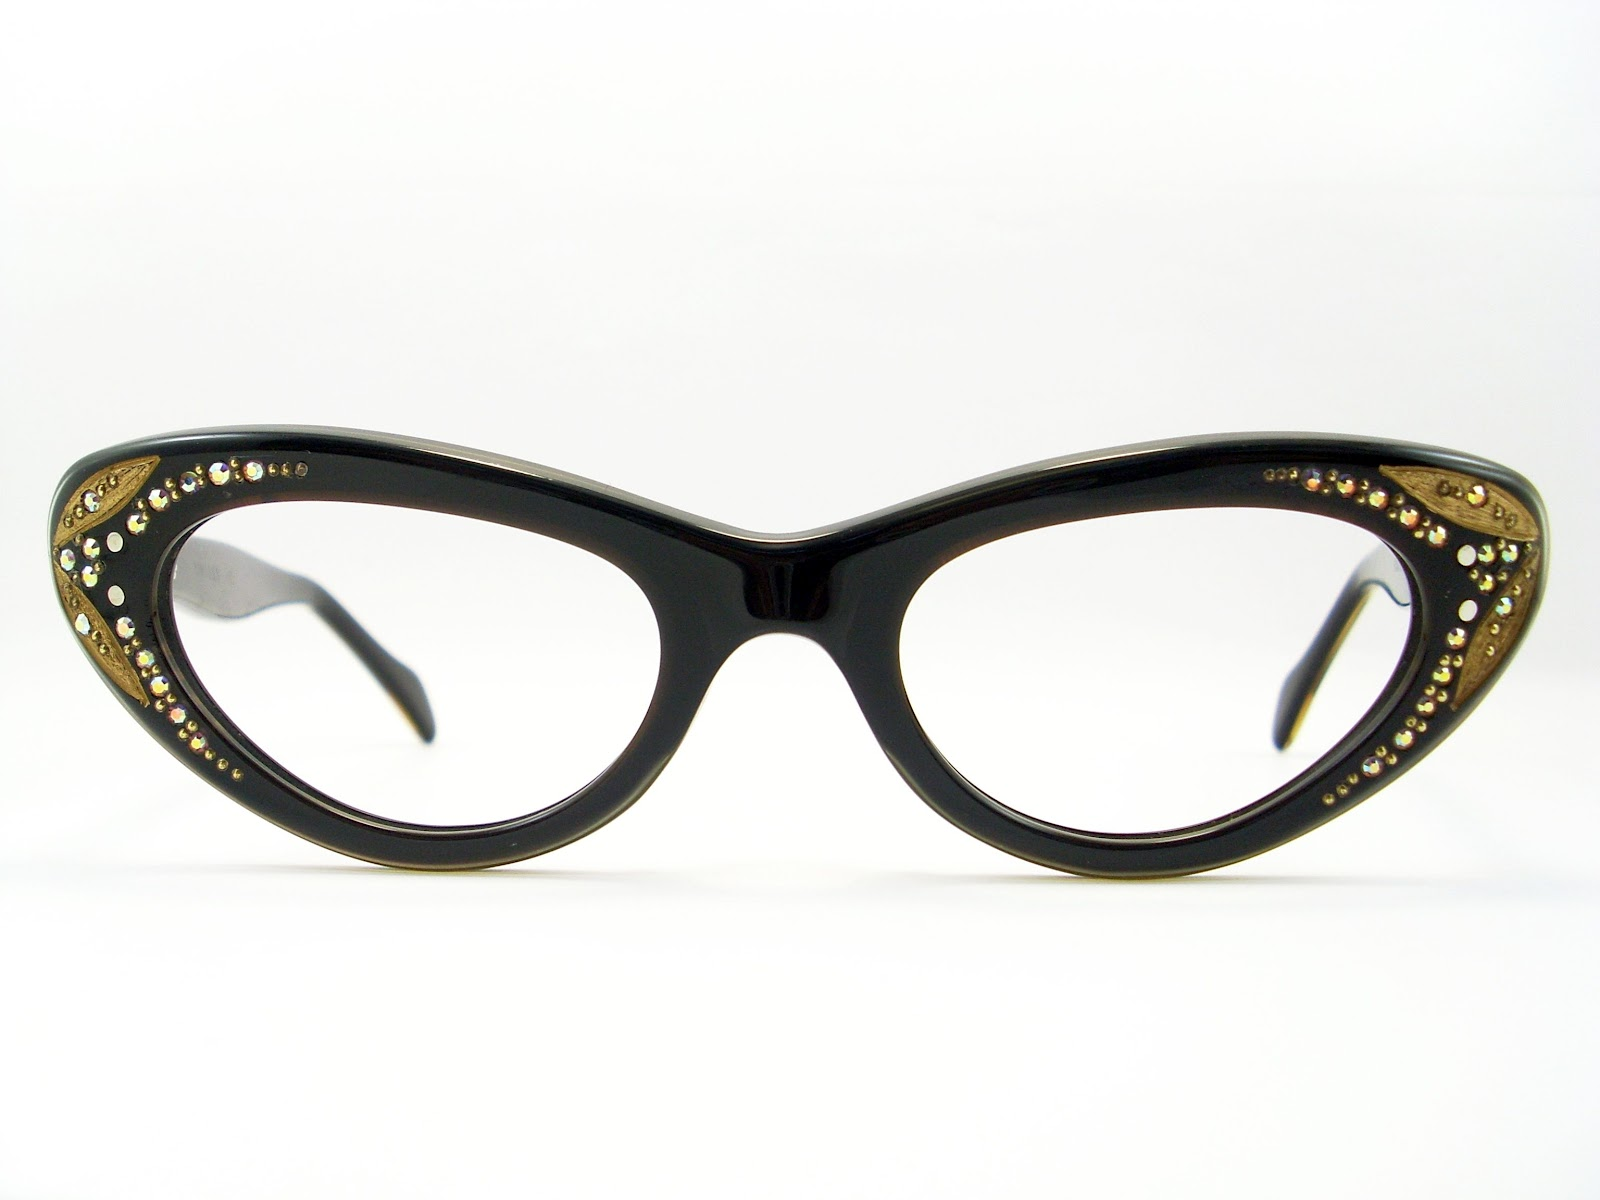 Glasses Frame Cat Eye : Vintage Eyeglasses Frames Eyewear Sunglasses 50S: Vintage ...